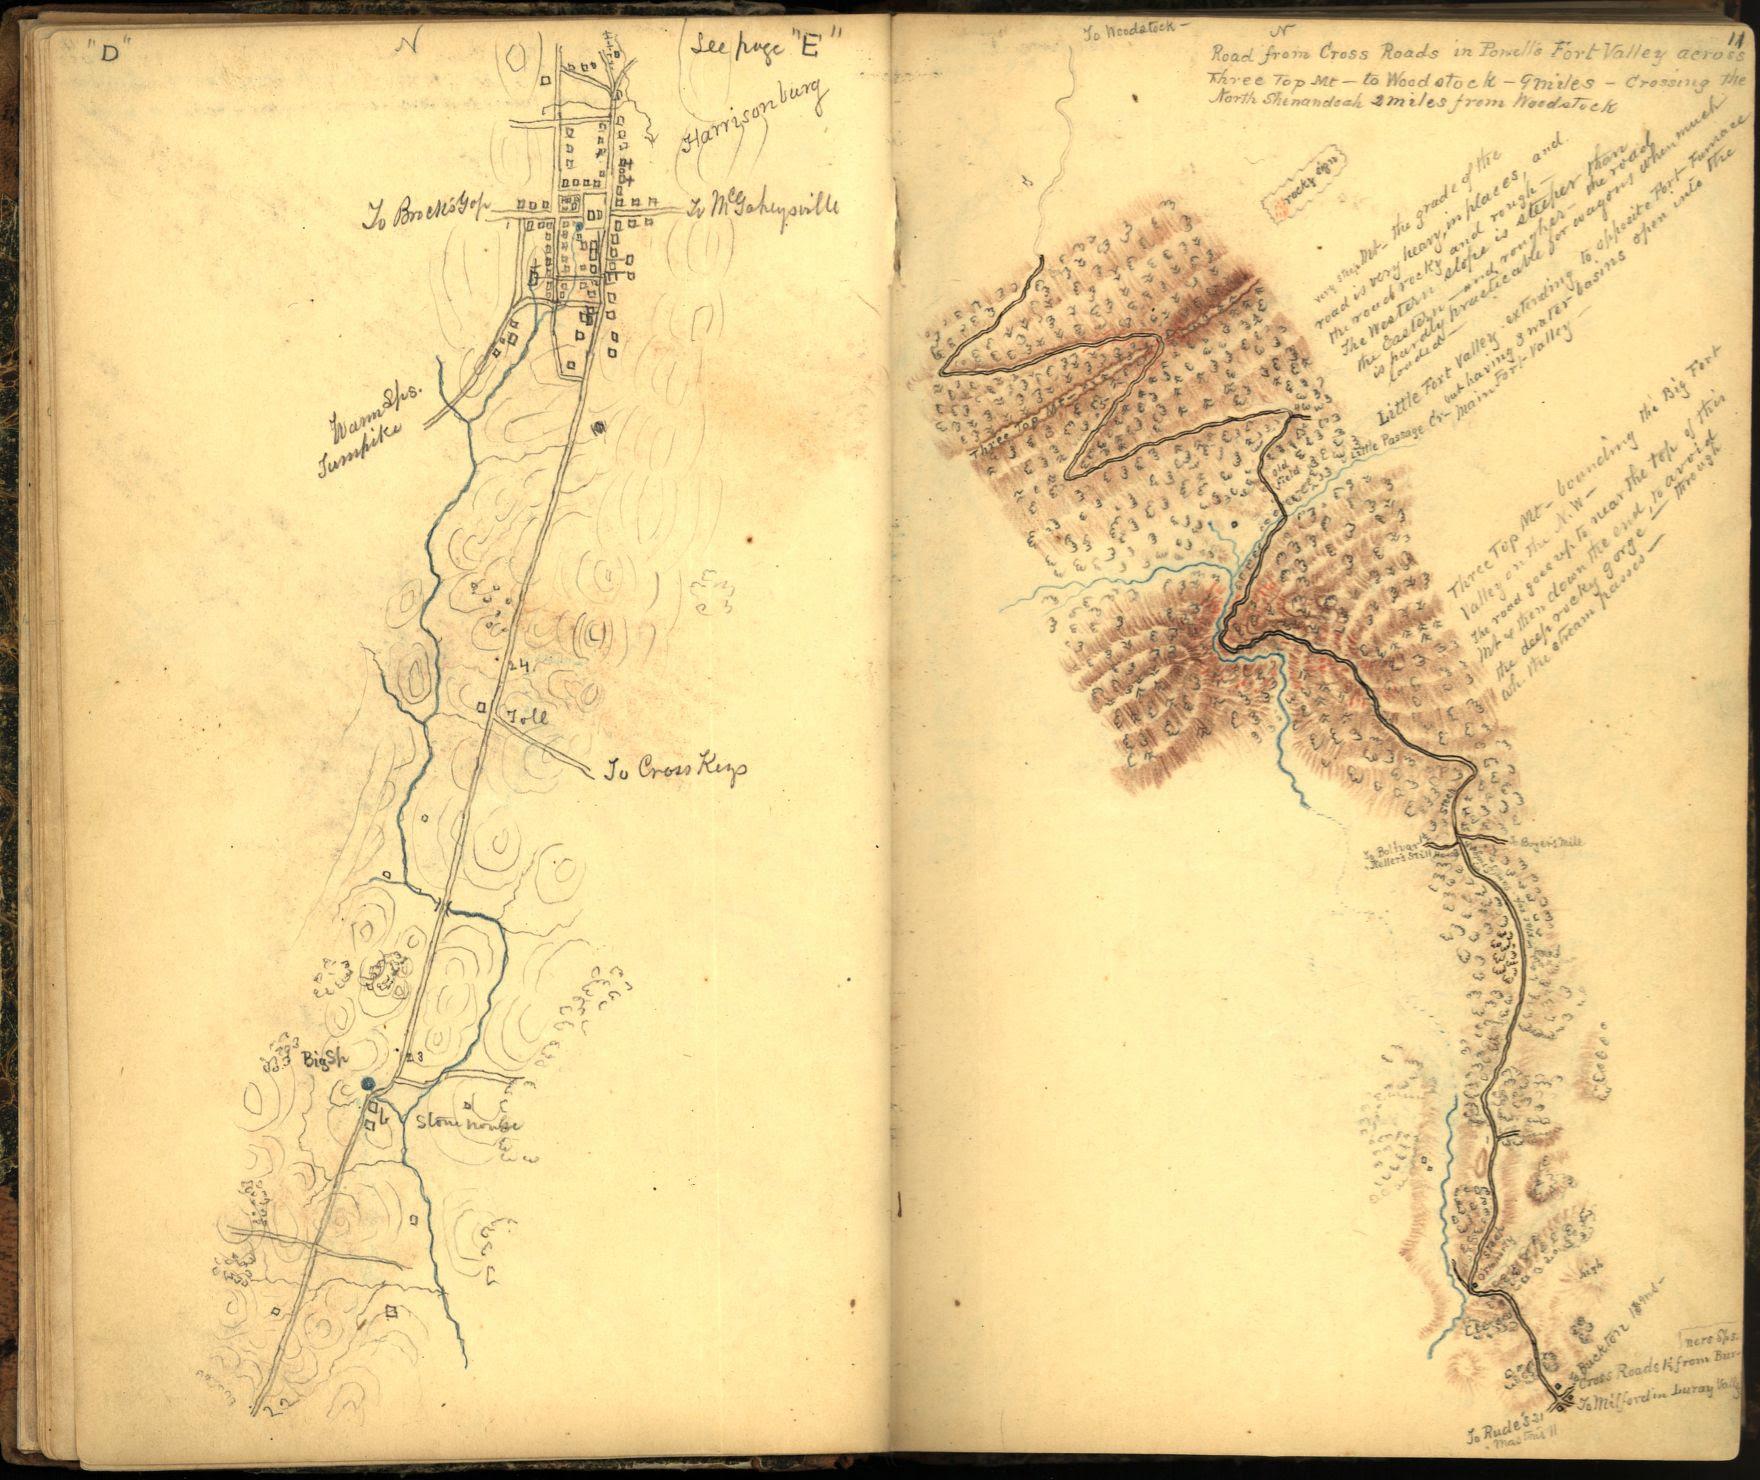 Jed Hotchkiss Maps The Shenandoah Valley Civil War Profiles